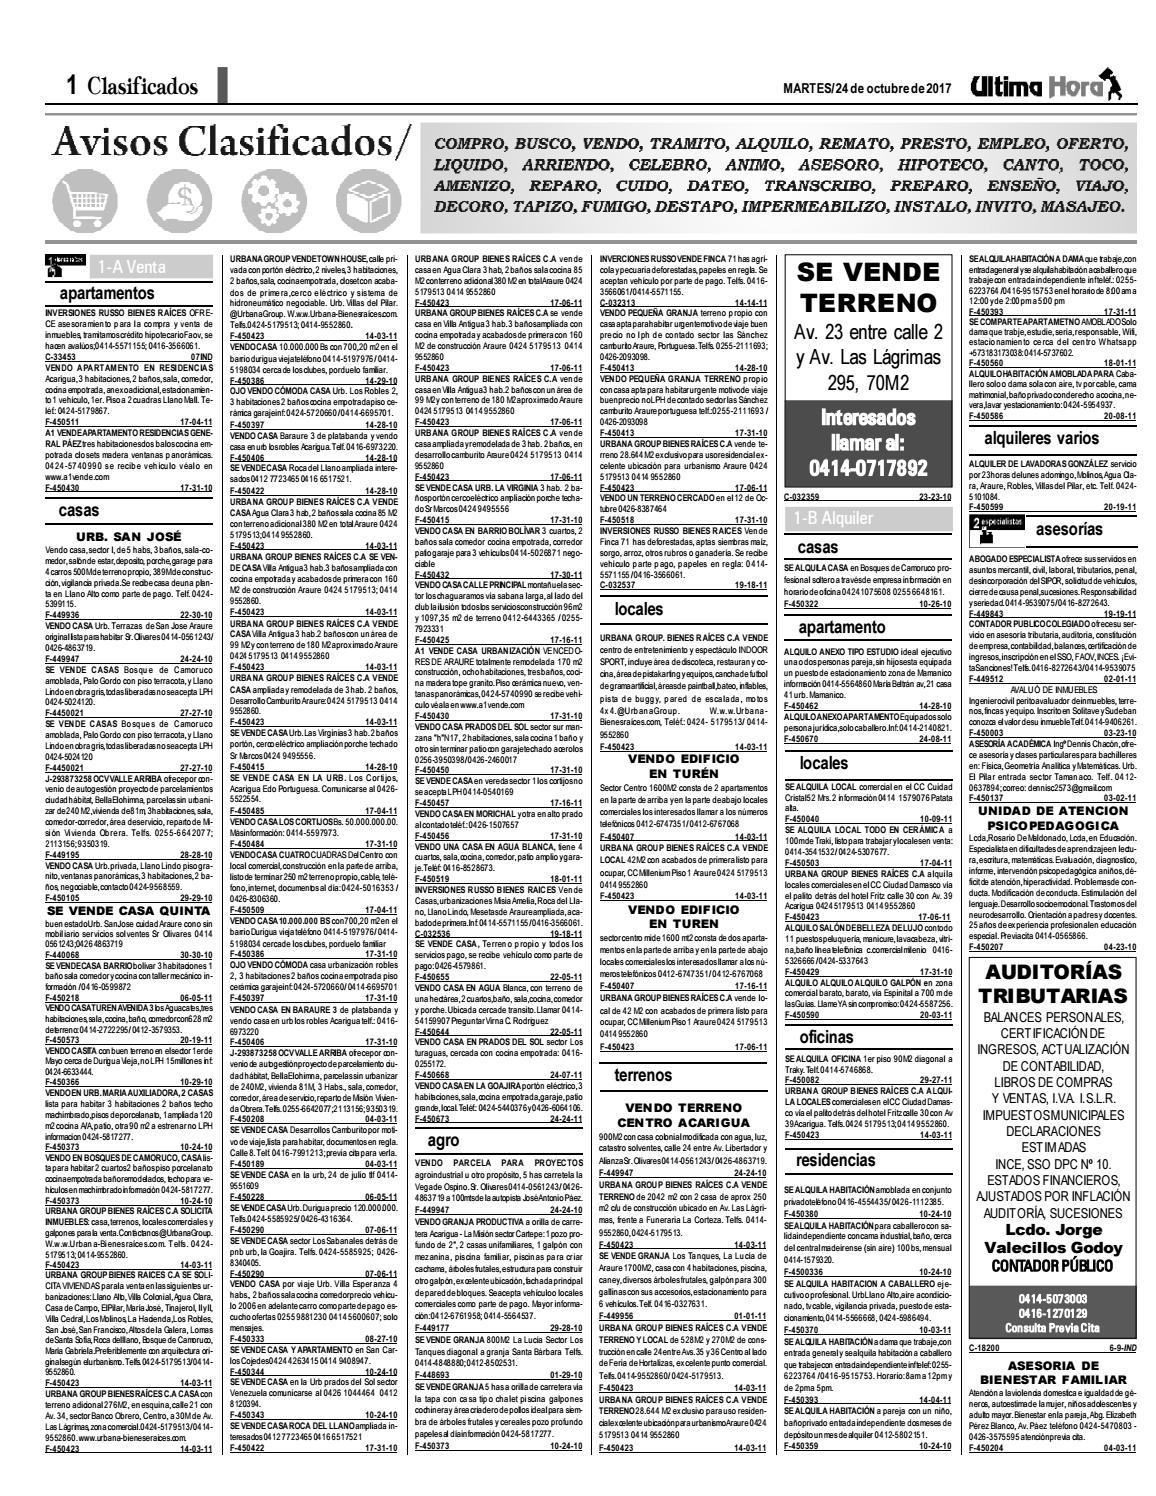 Clasificados 24 10 2017 by Clasificados Ultima Hora - issuu